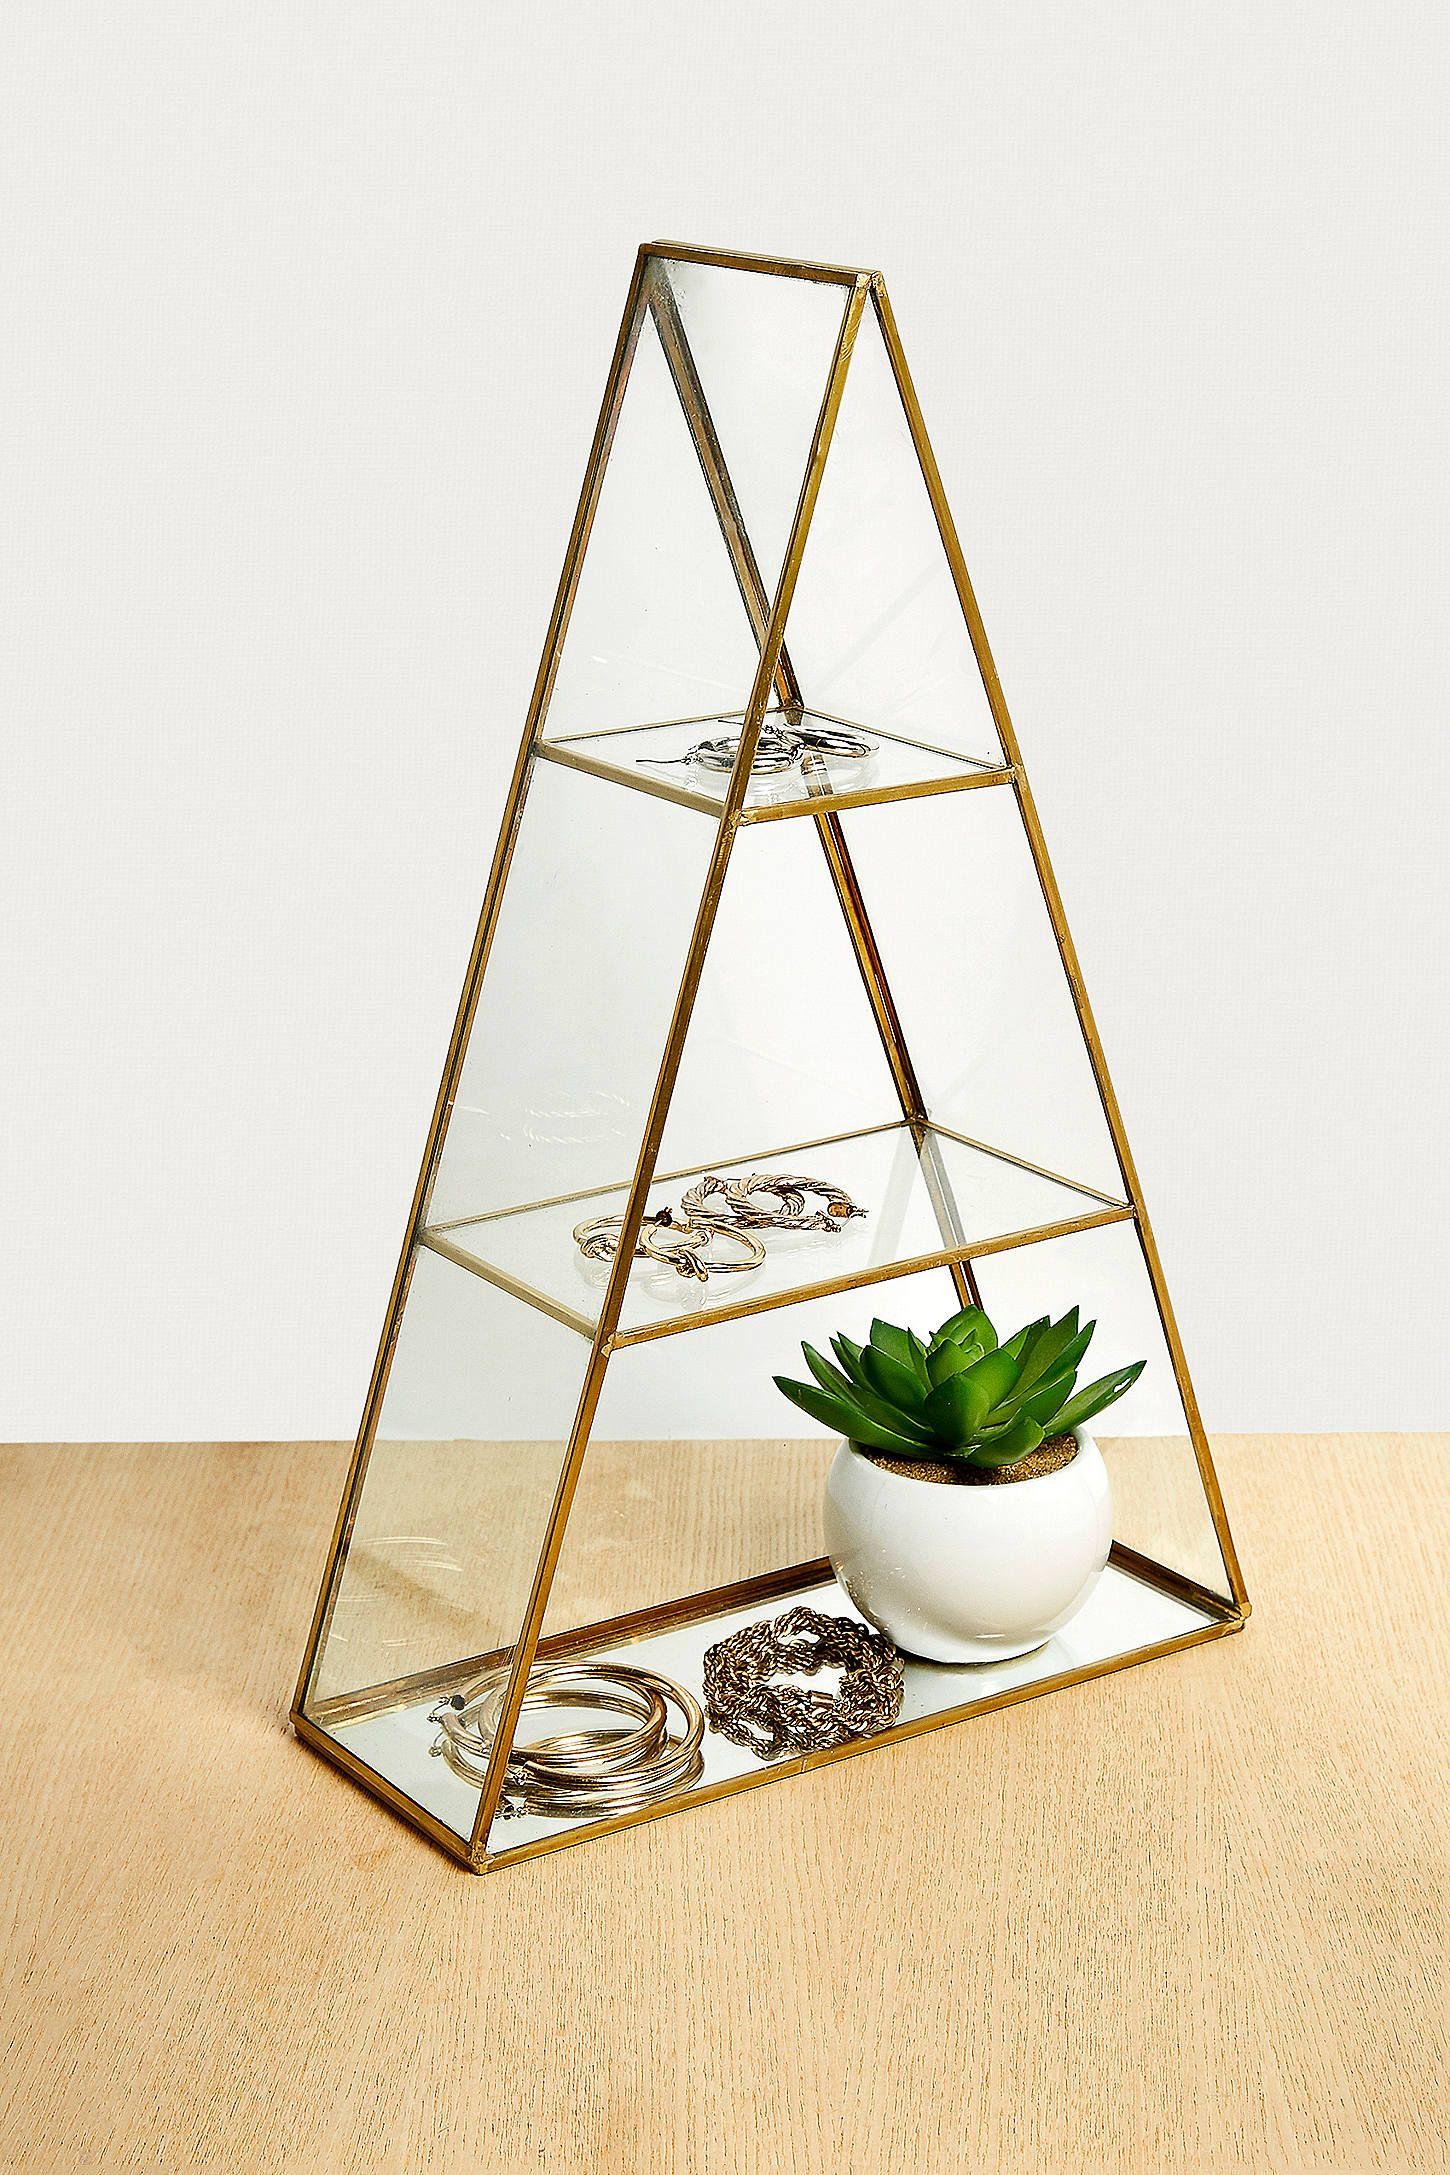 Grande boîte murale triangulaire | Urban Outfitters FR | Parement mural, Rangement bijoux, Urban ...